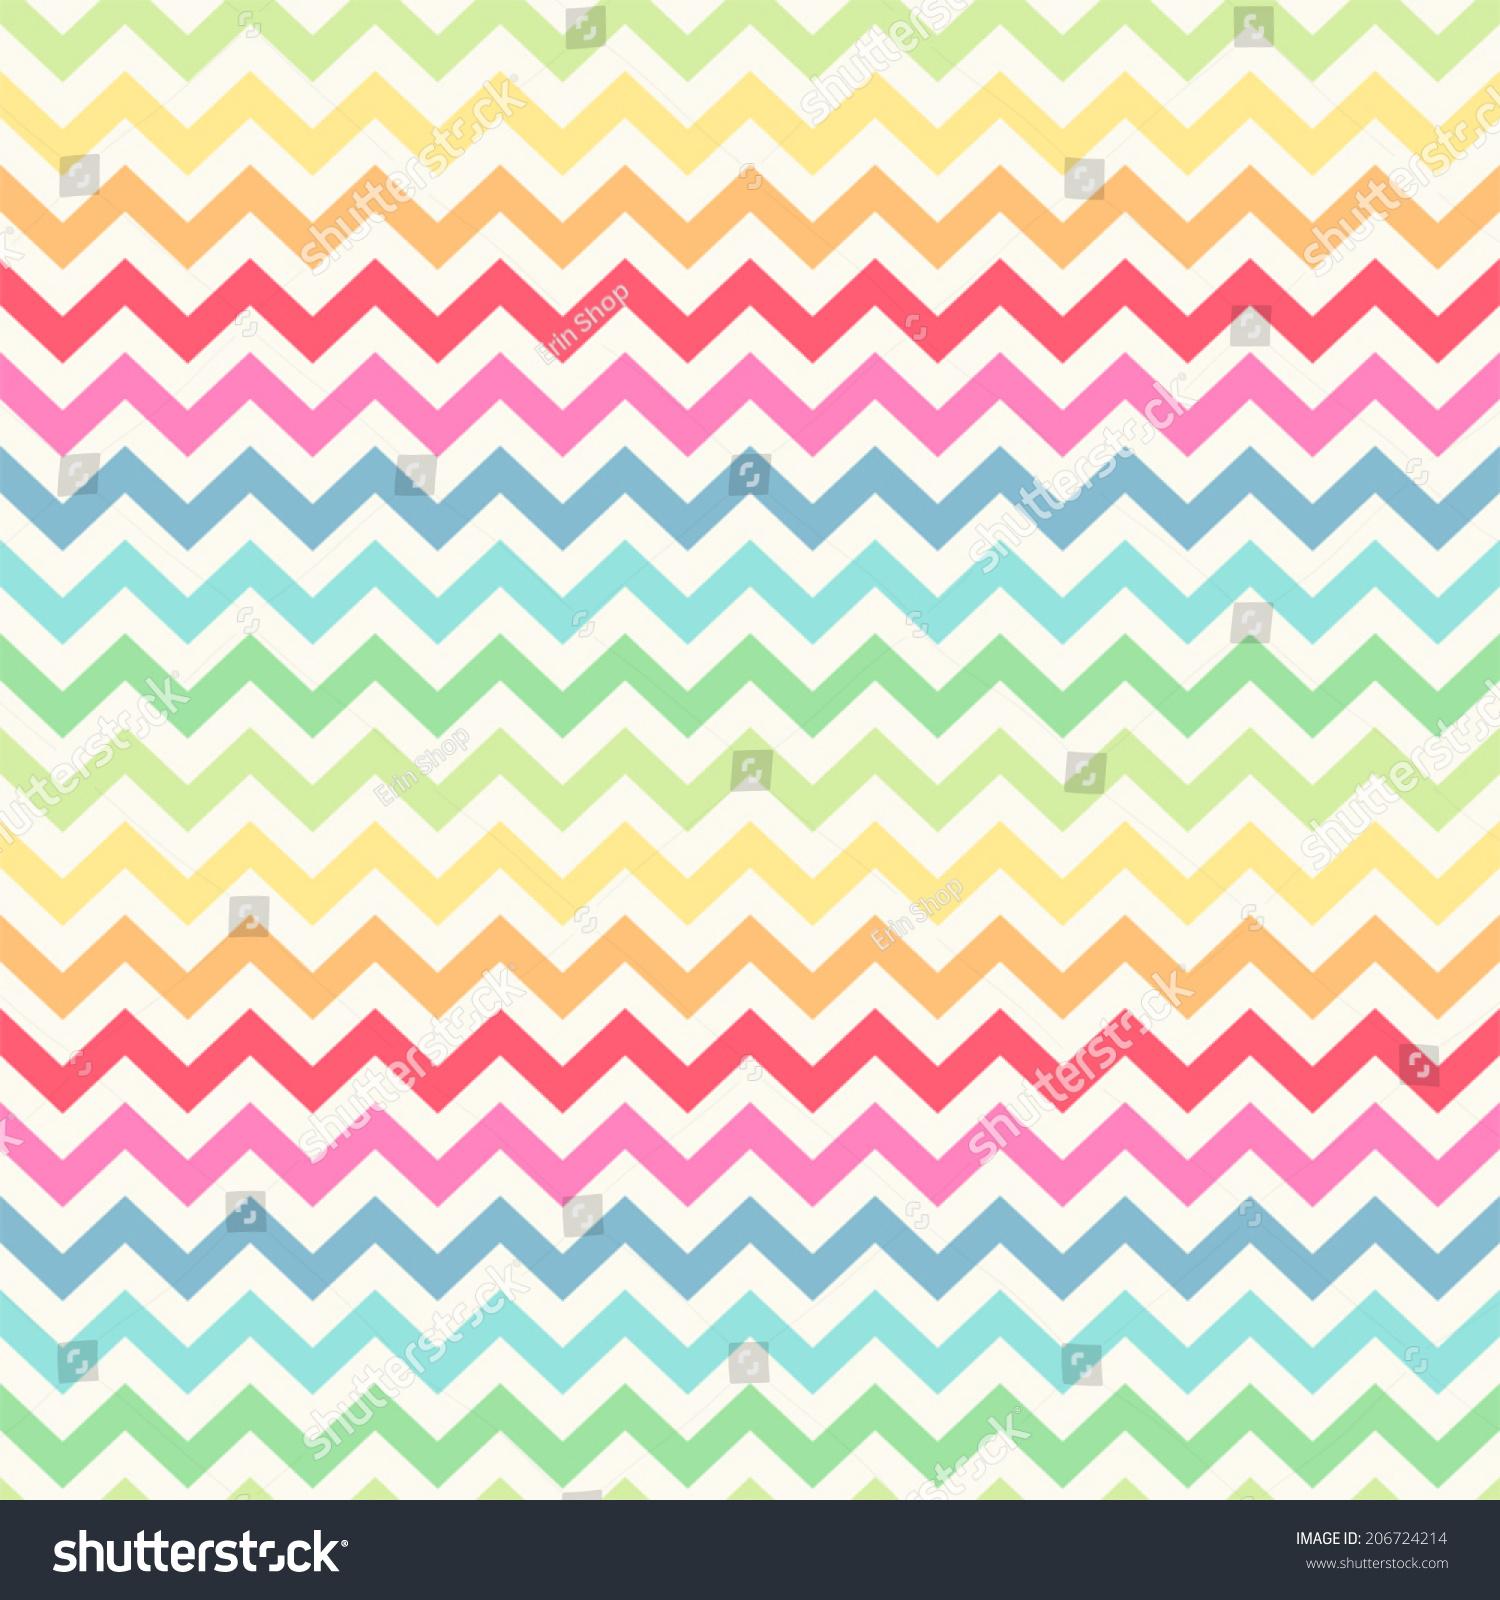 Cute Retro Chevron Seamless Pattern Rainbow Stock Vector